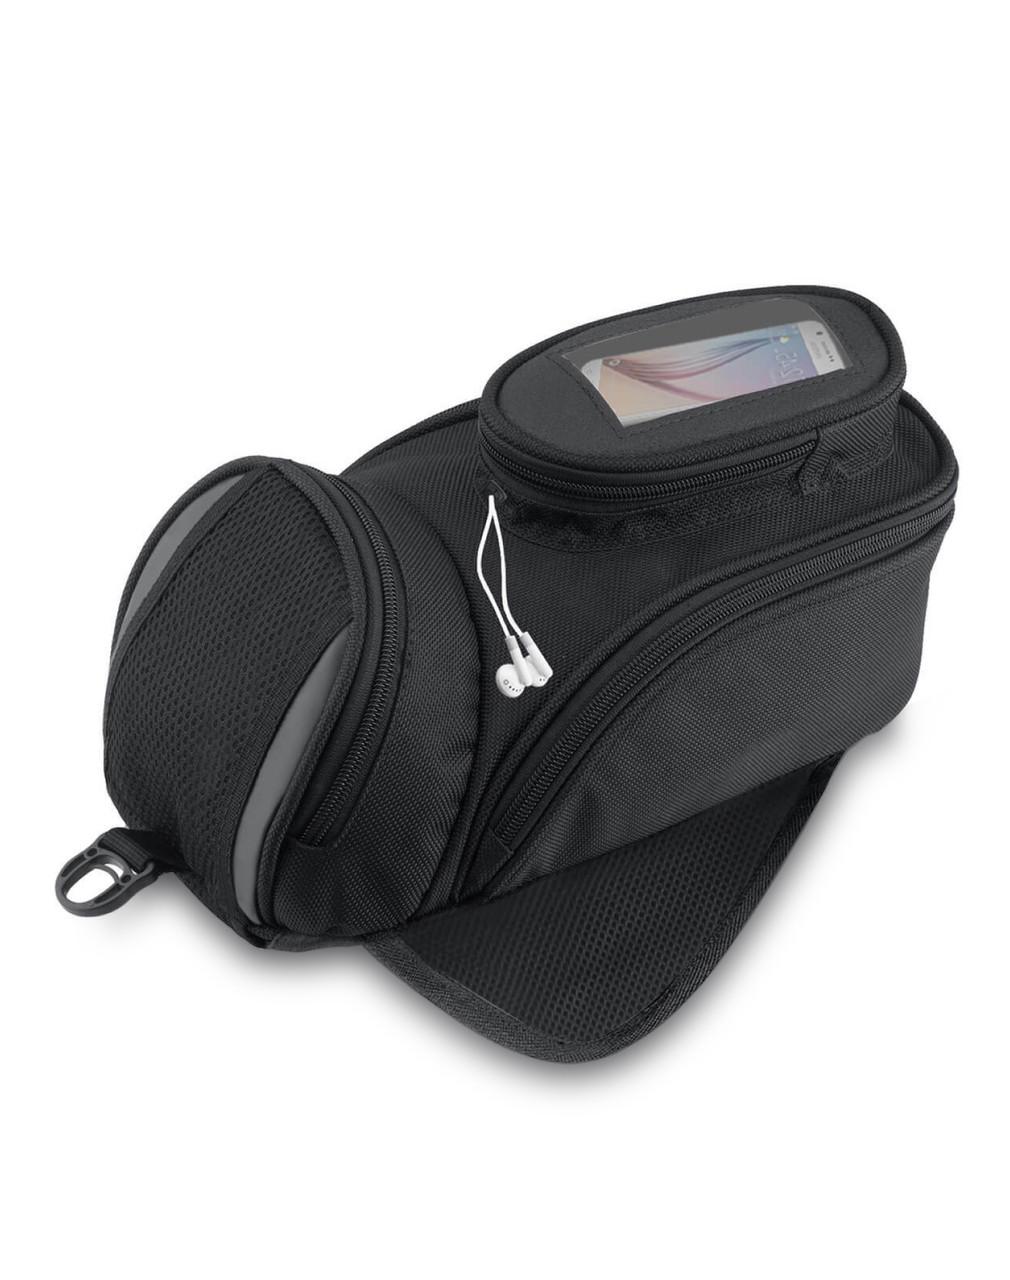 VikingBags Survival Series Large Black Street/Sportbike Tank Bag Main Bag View